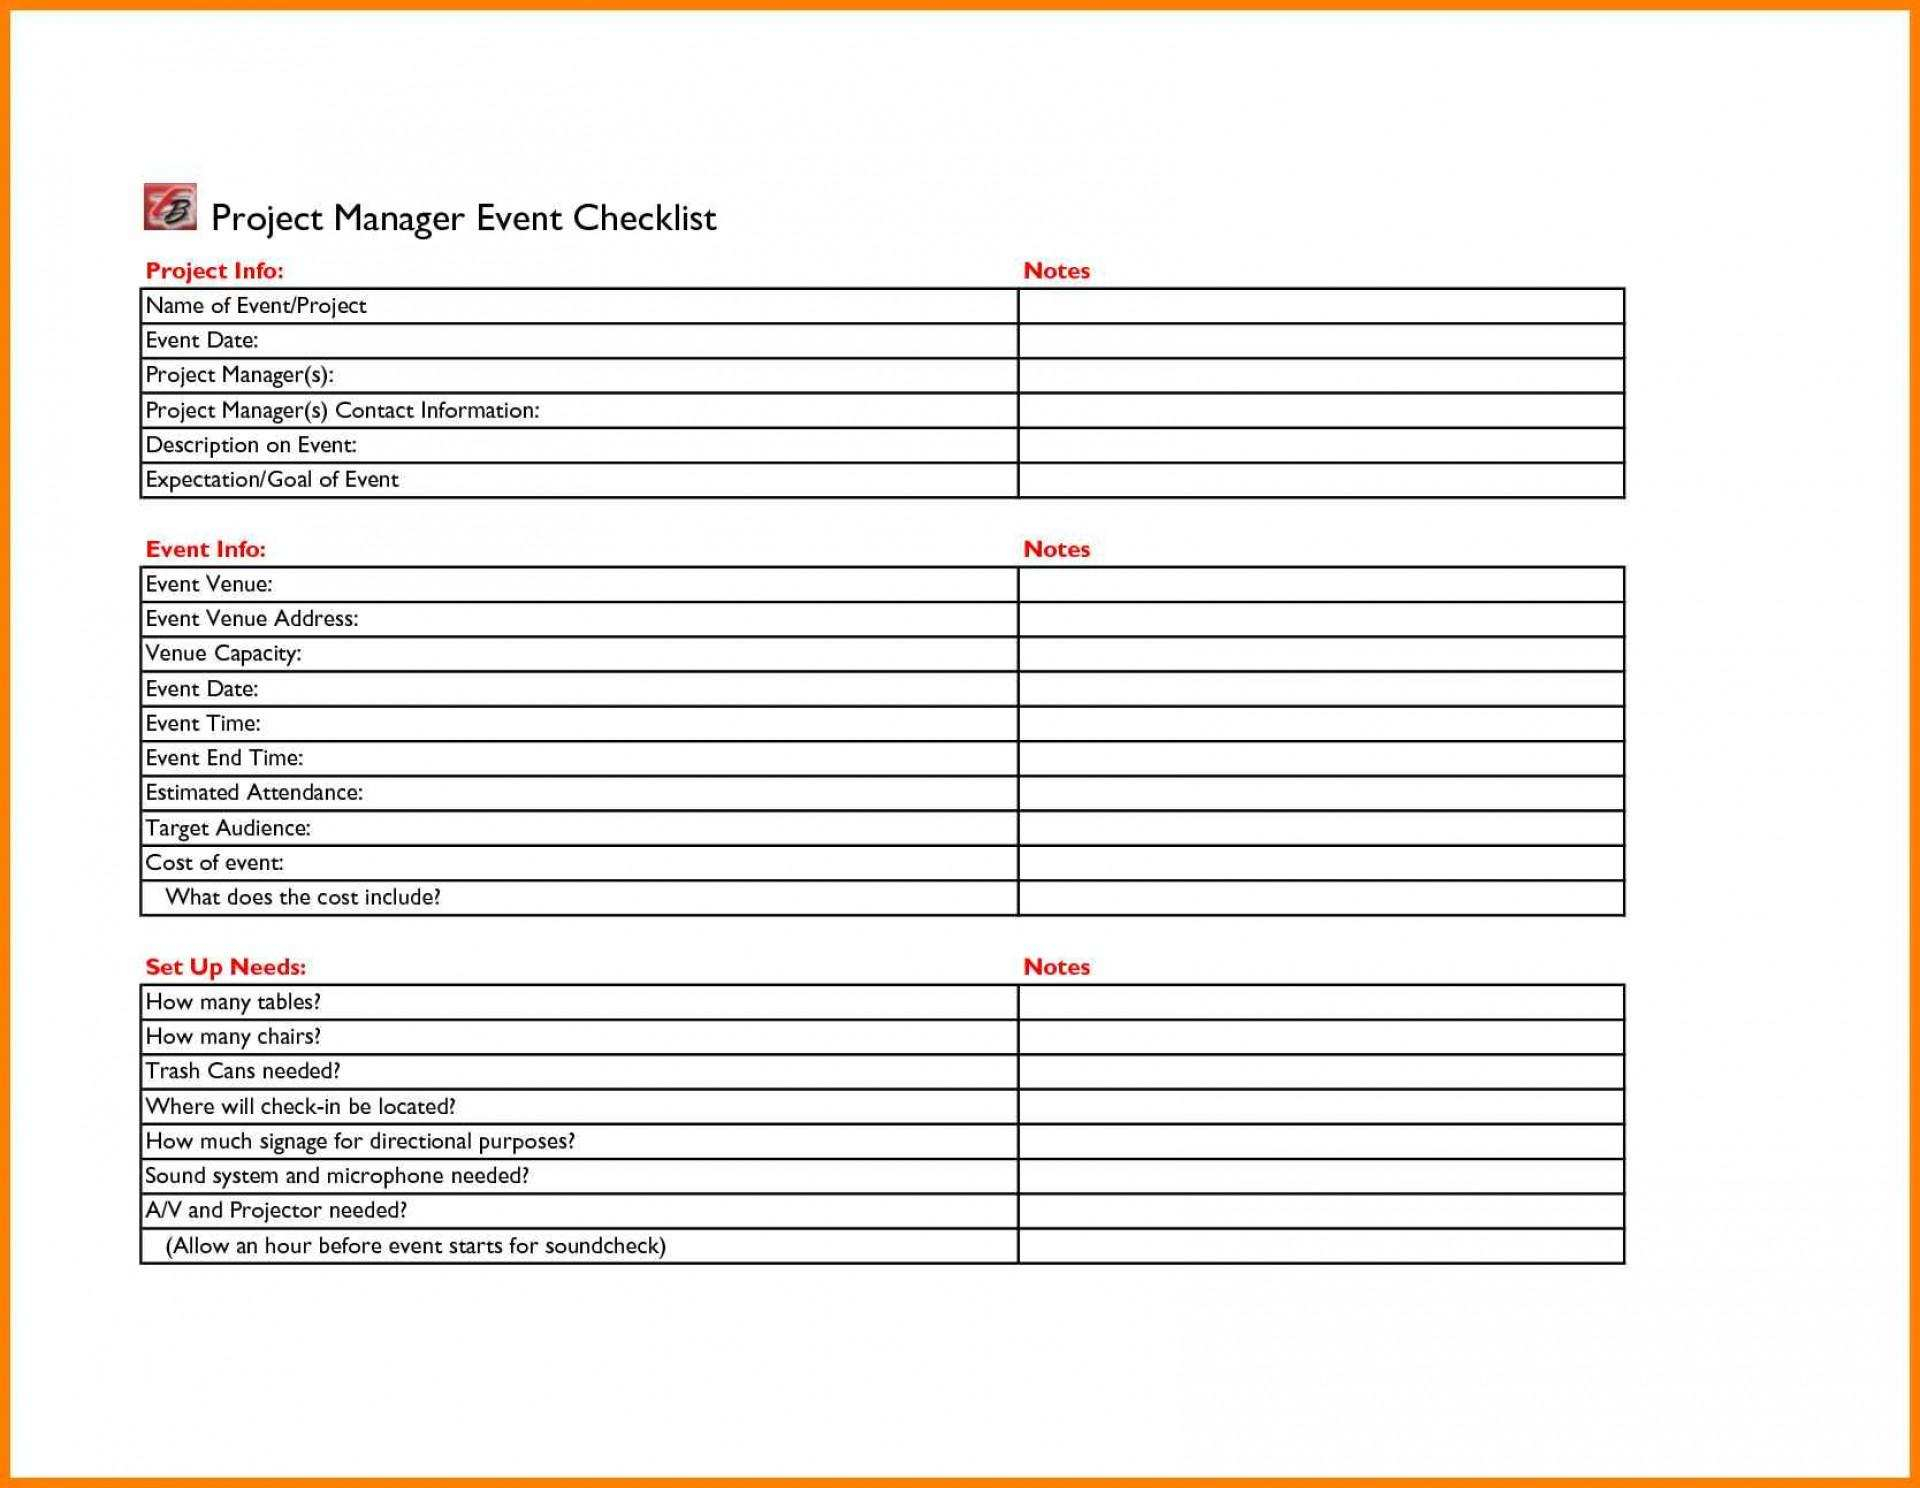 Event Planning Spreadsheet Excel Regarding 008 Template Ideas Free Event Planning Templates Excel Eventning